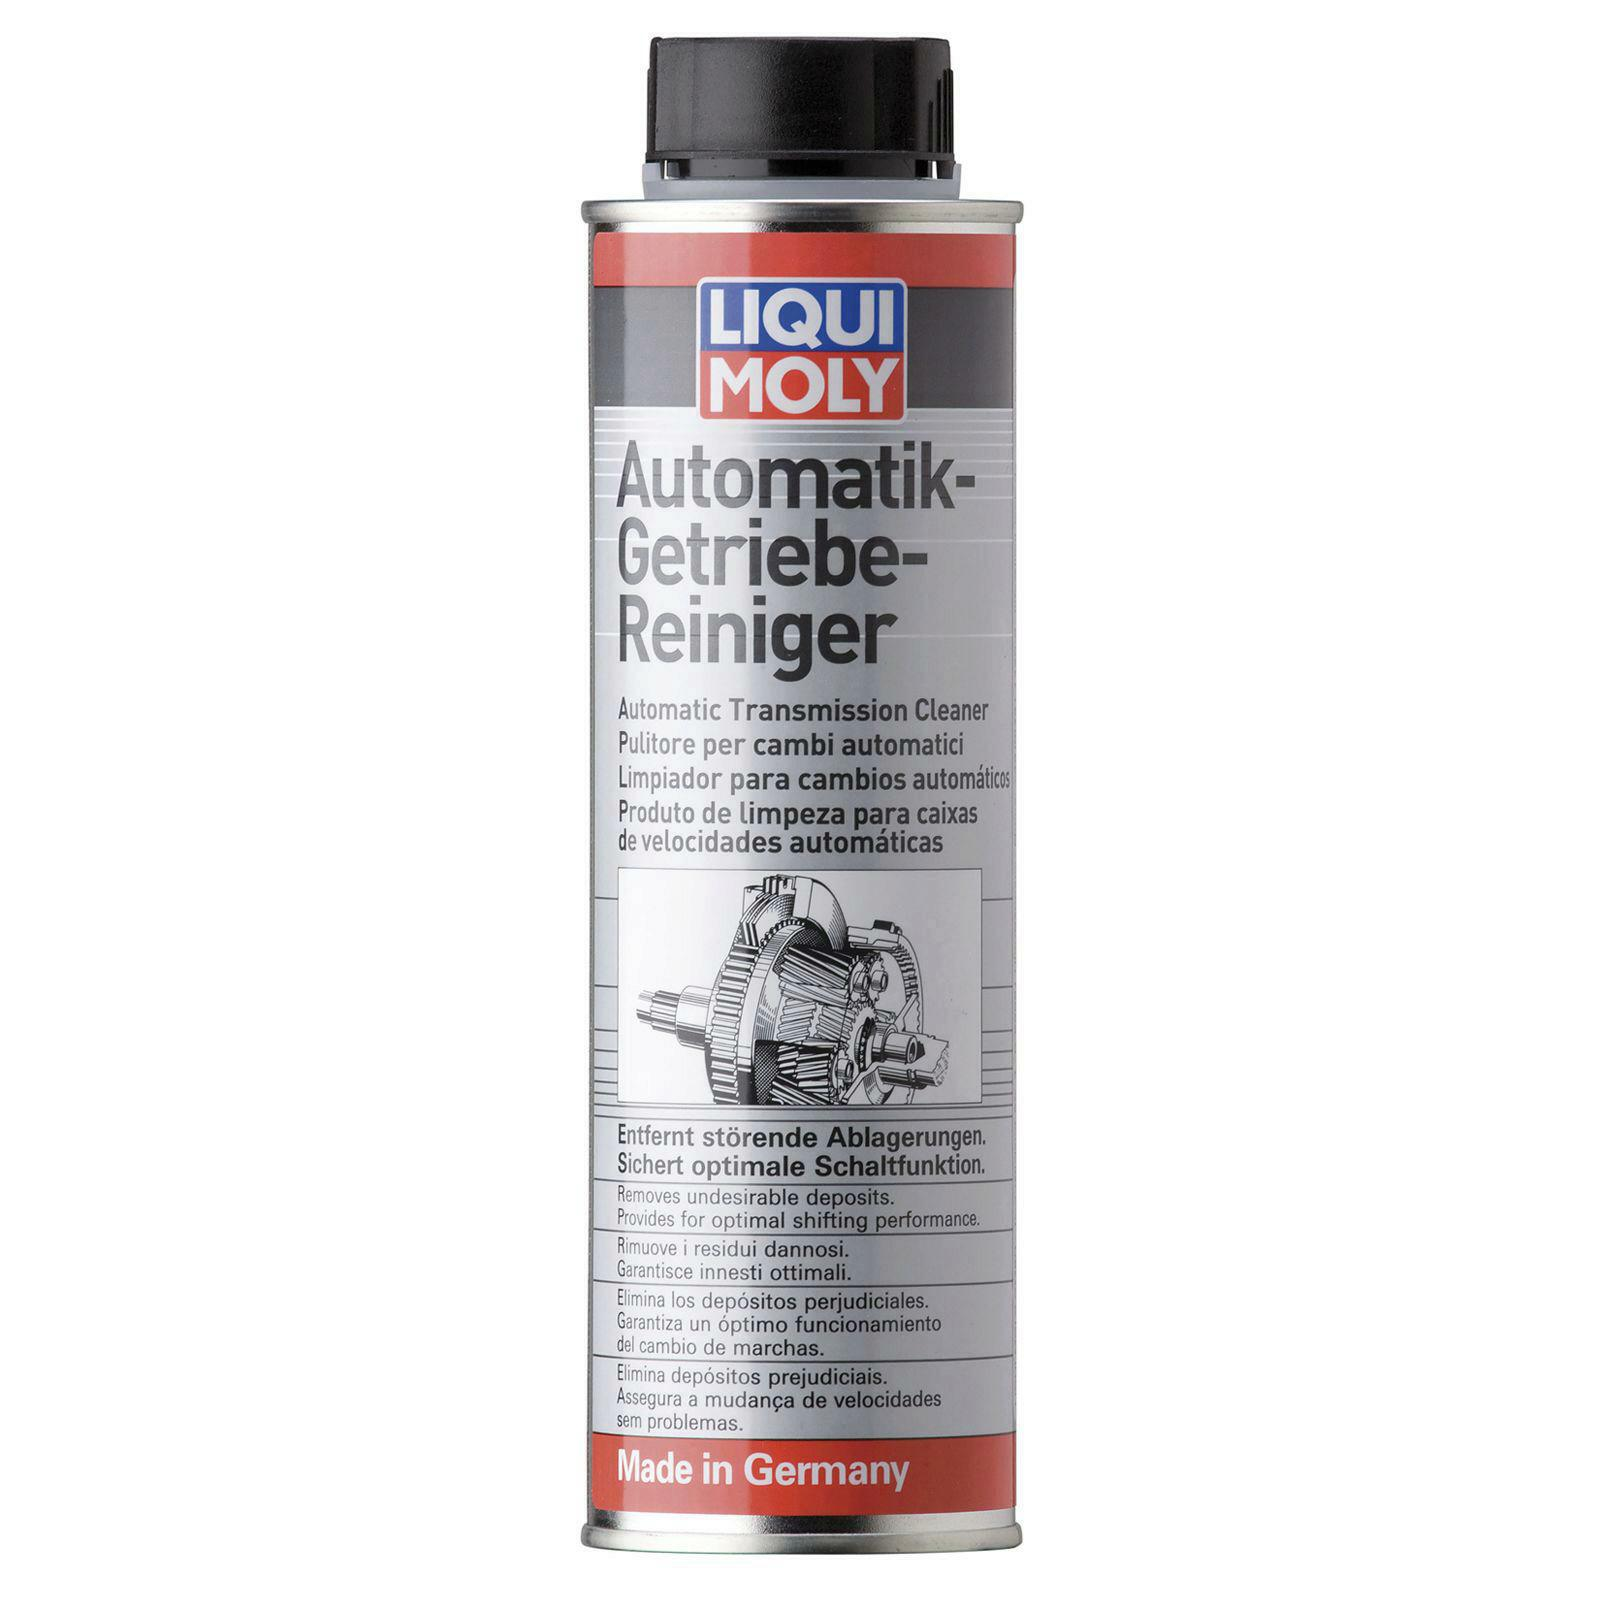 Liqui Moly Automatik-Getriebe-Reiniger 300ml